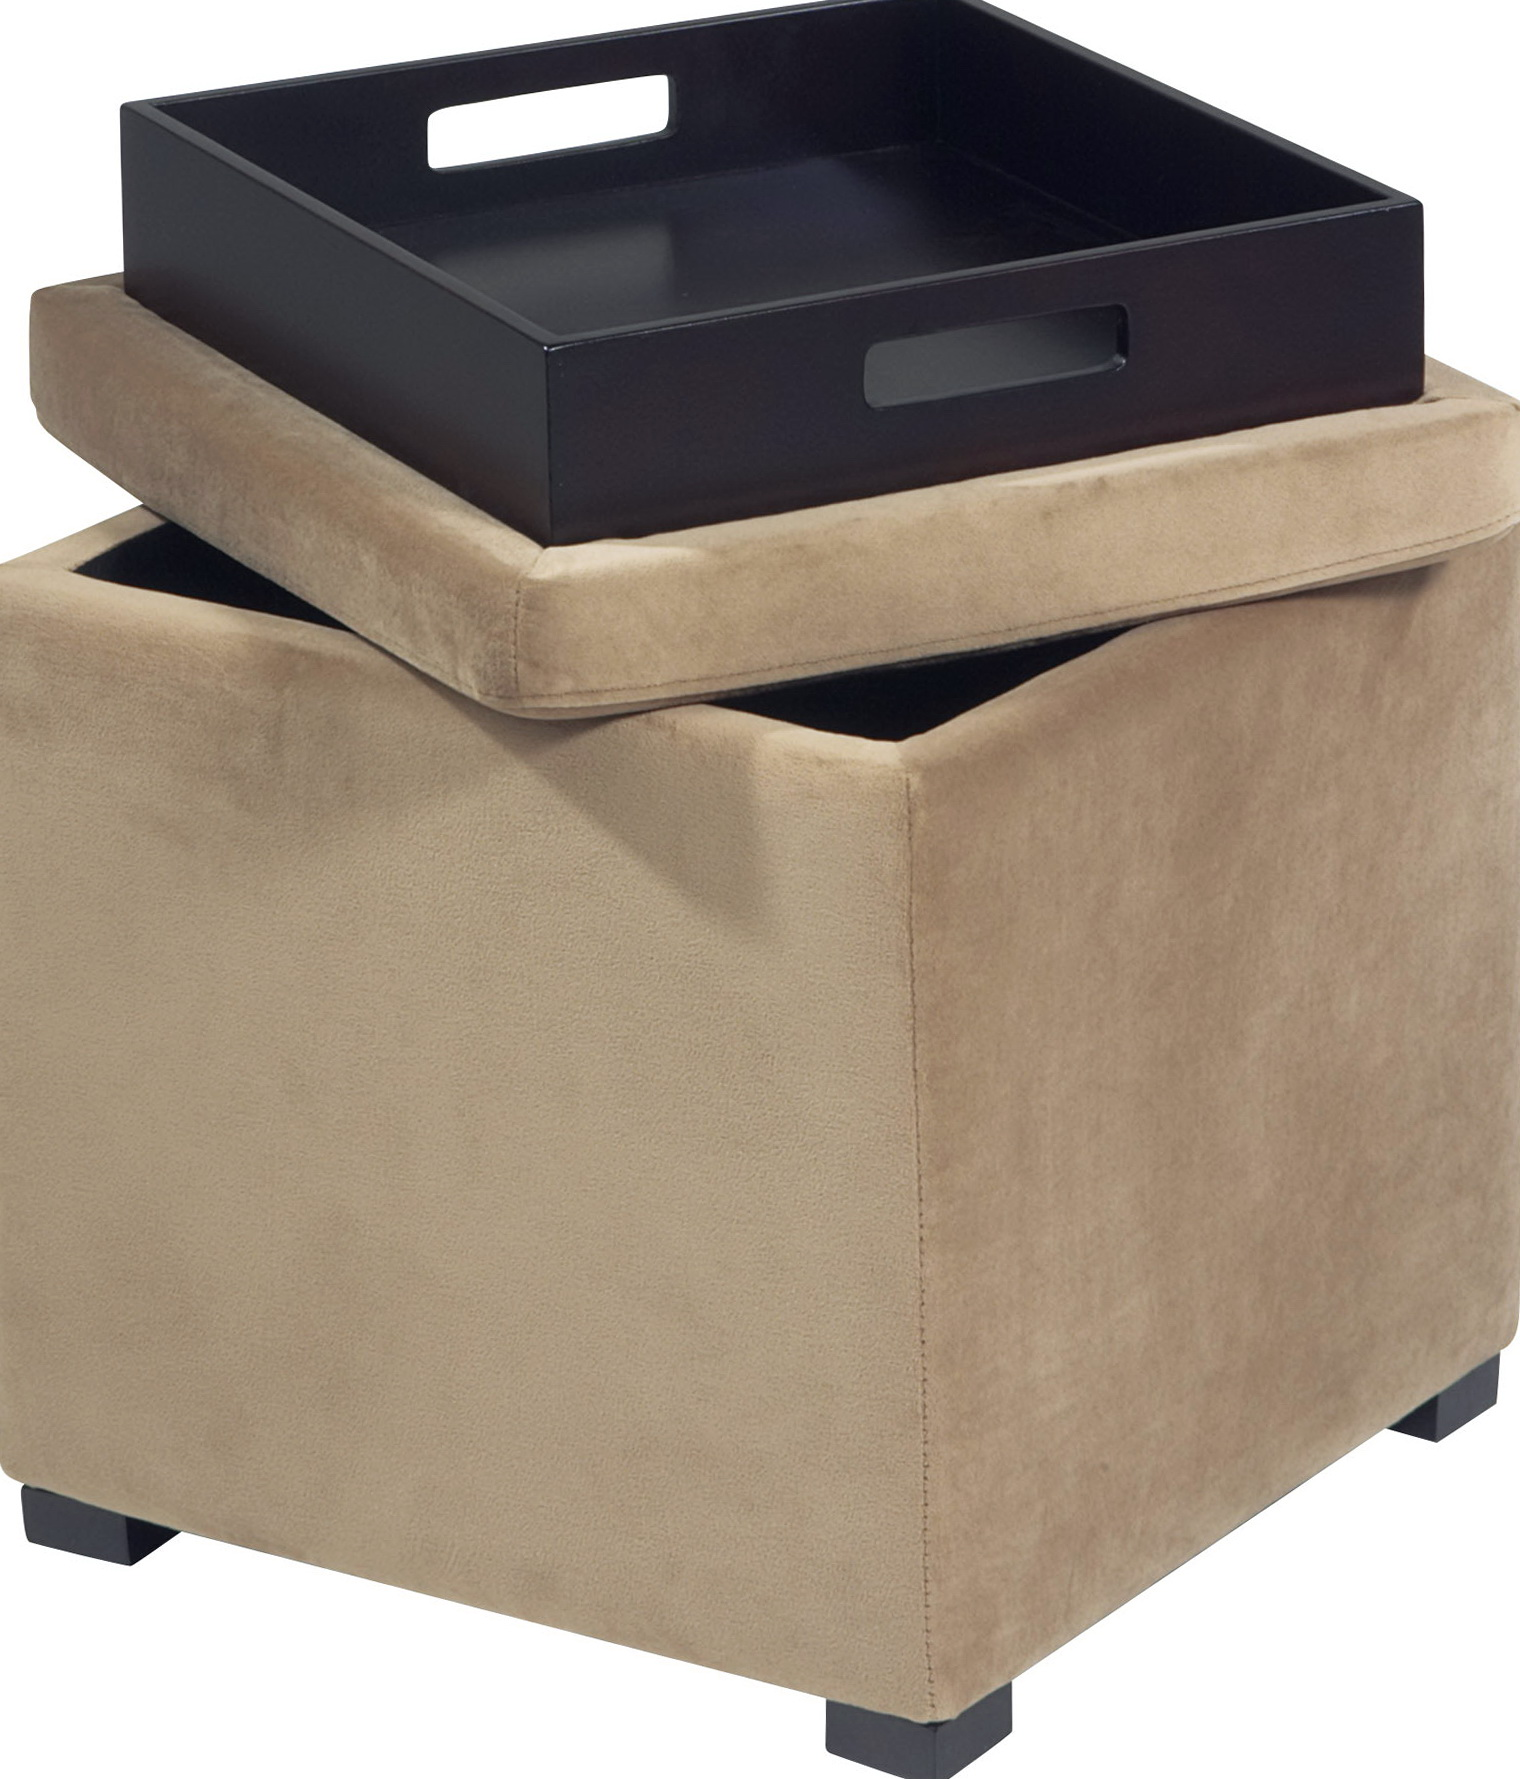 Small storage ottoman with tray home design ideas for Small ottoman storage